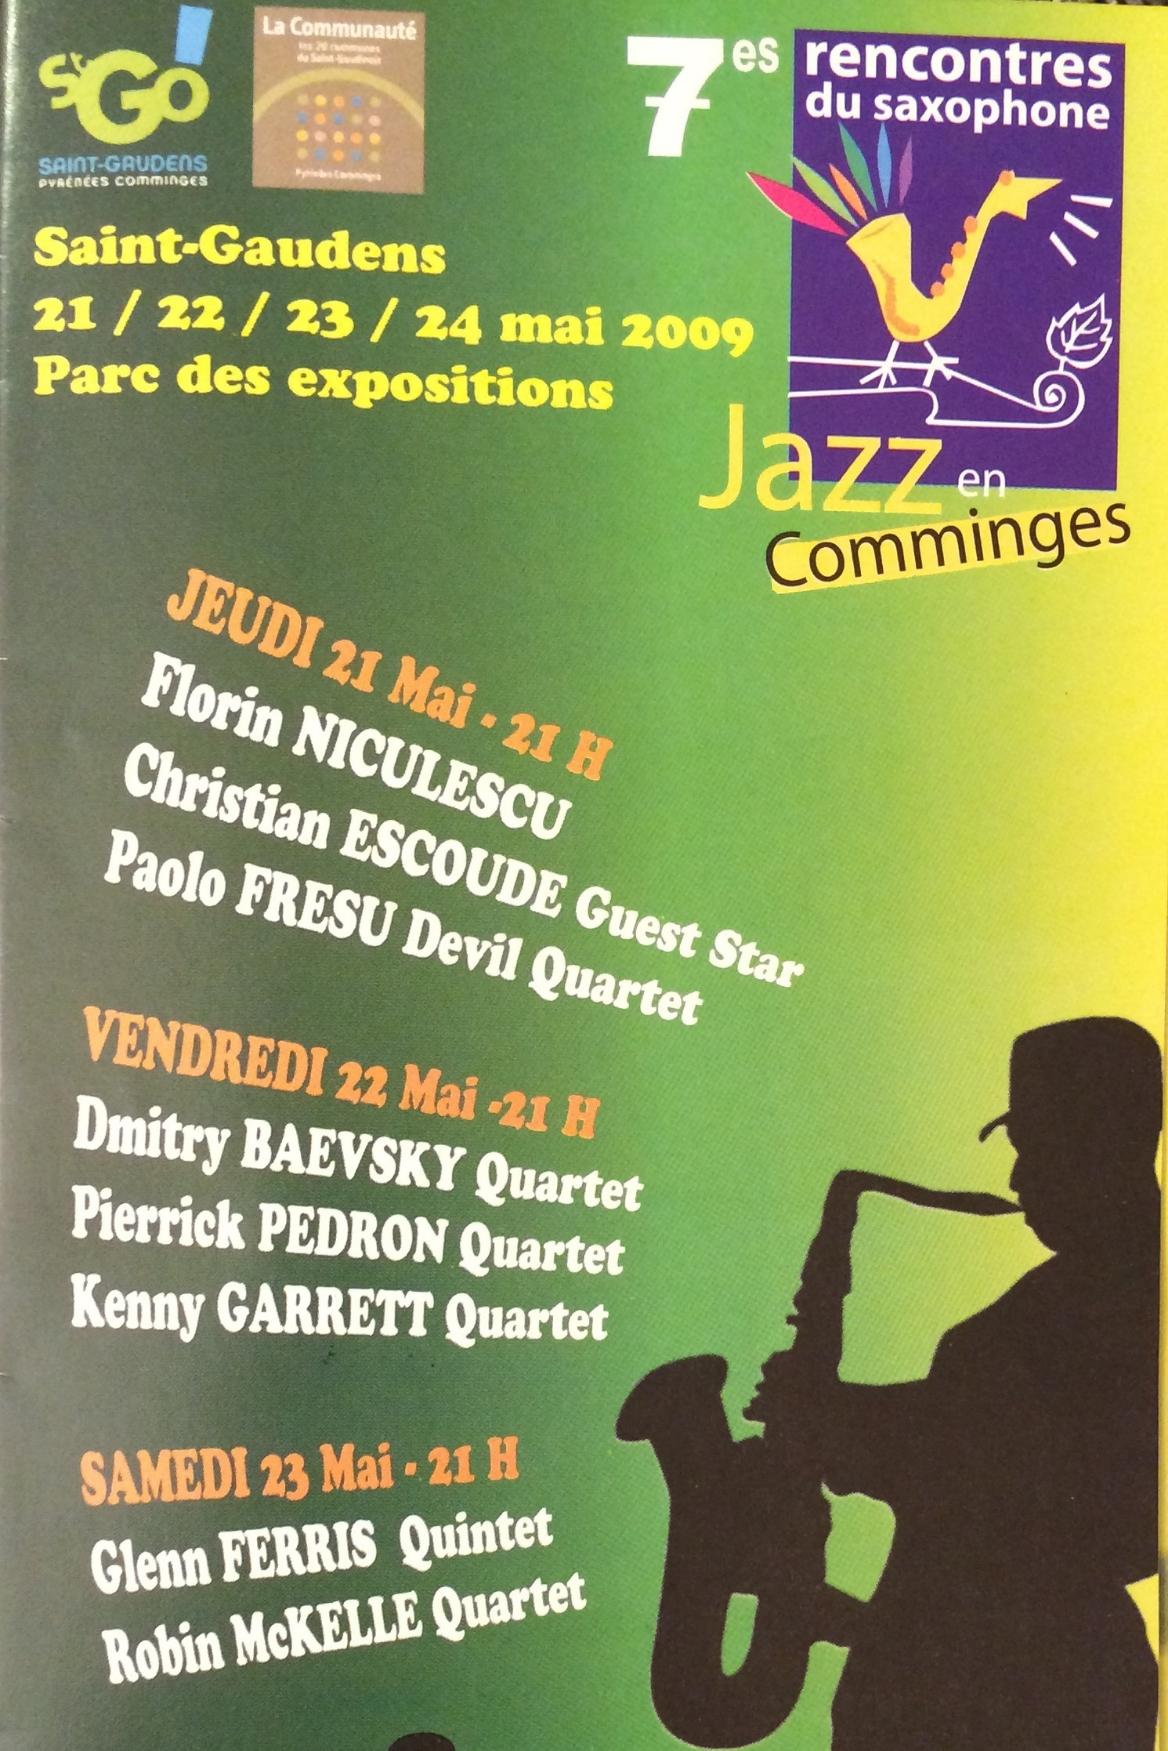 Rencontres du saxophone 2009.jpg